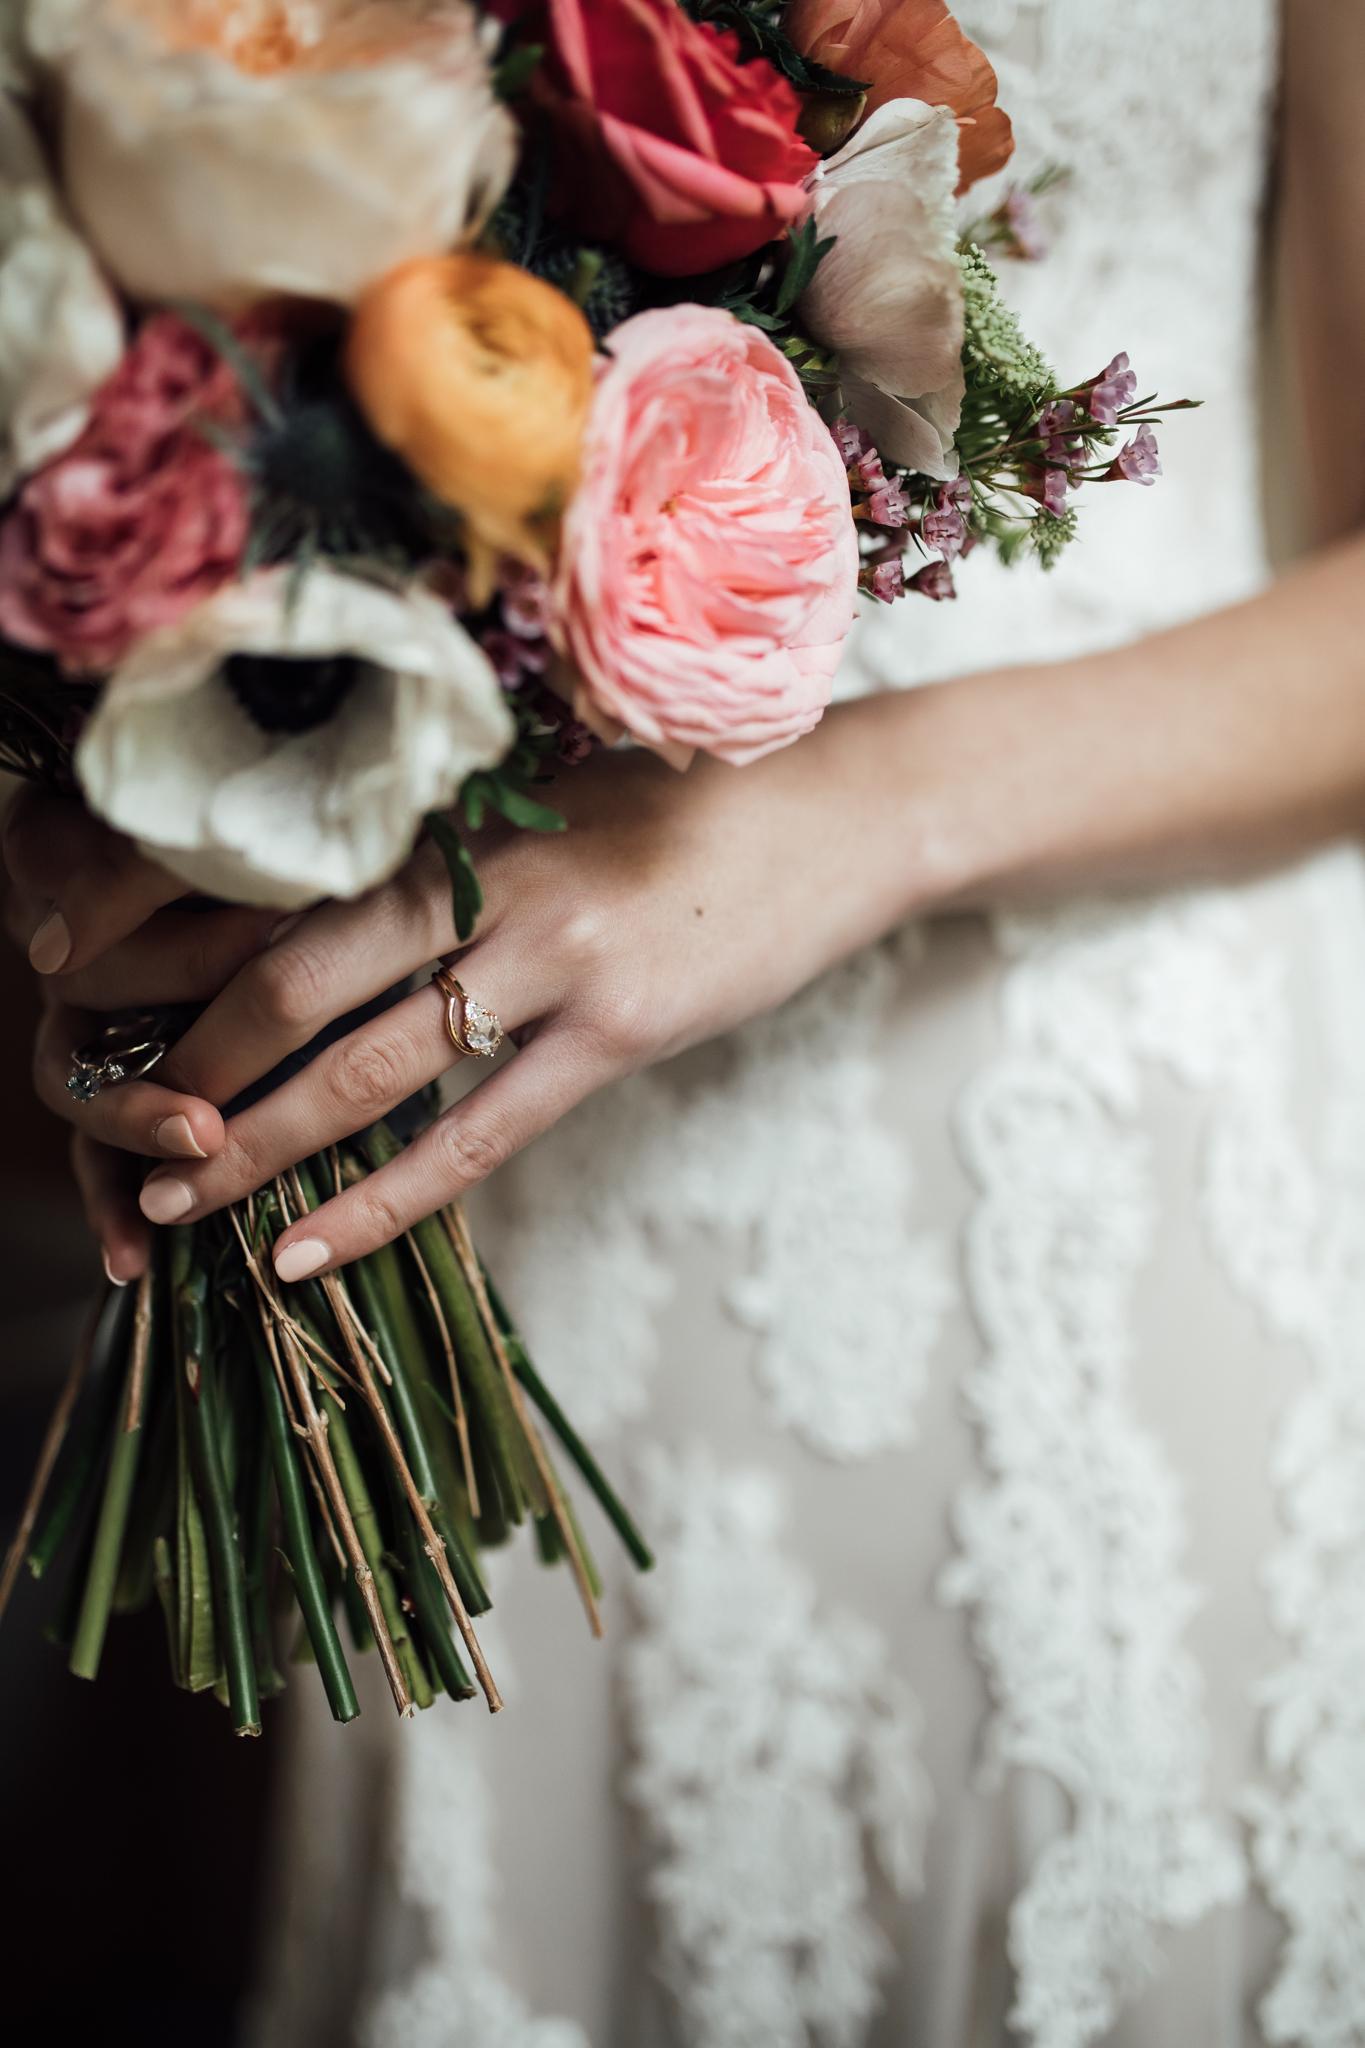 birmingham-alabama-wedding-photographer-laura-terry-the-warmth-around-you (79 of 110).jpg